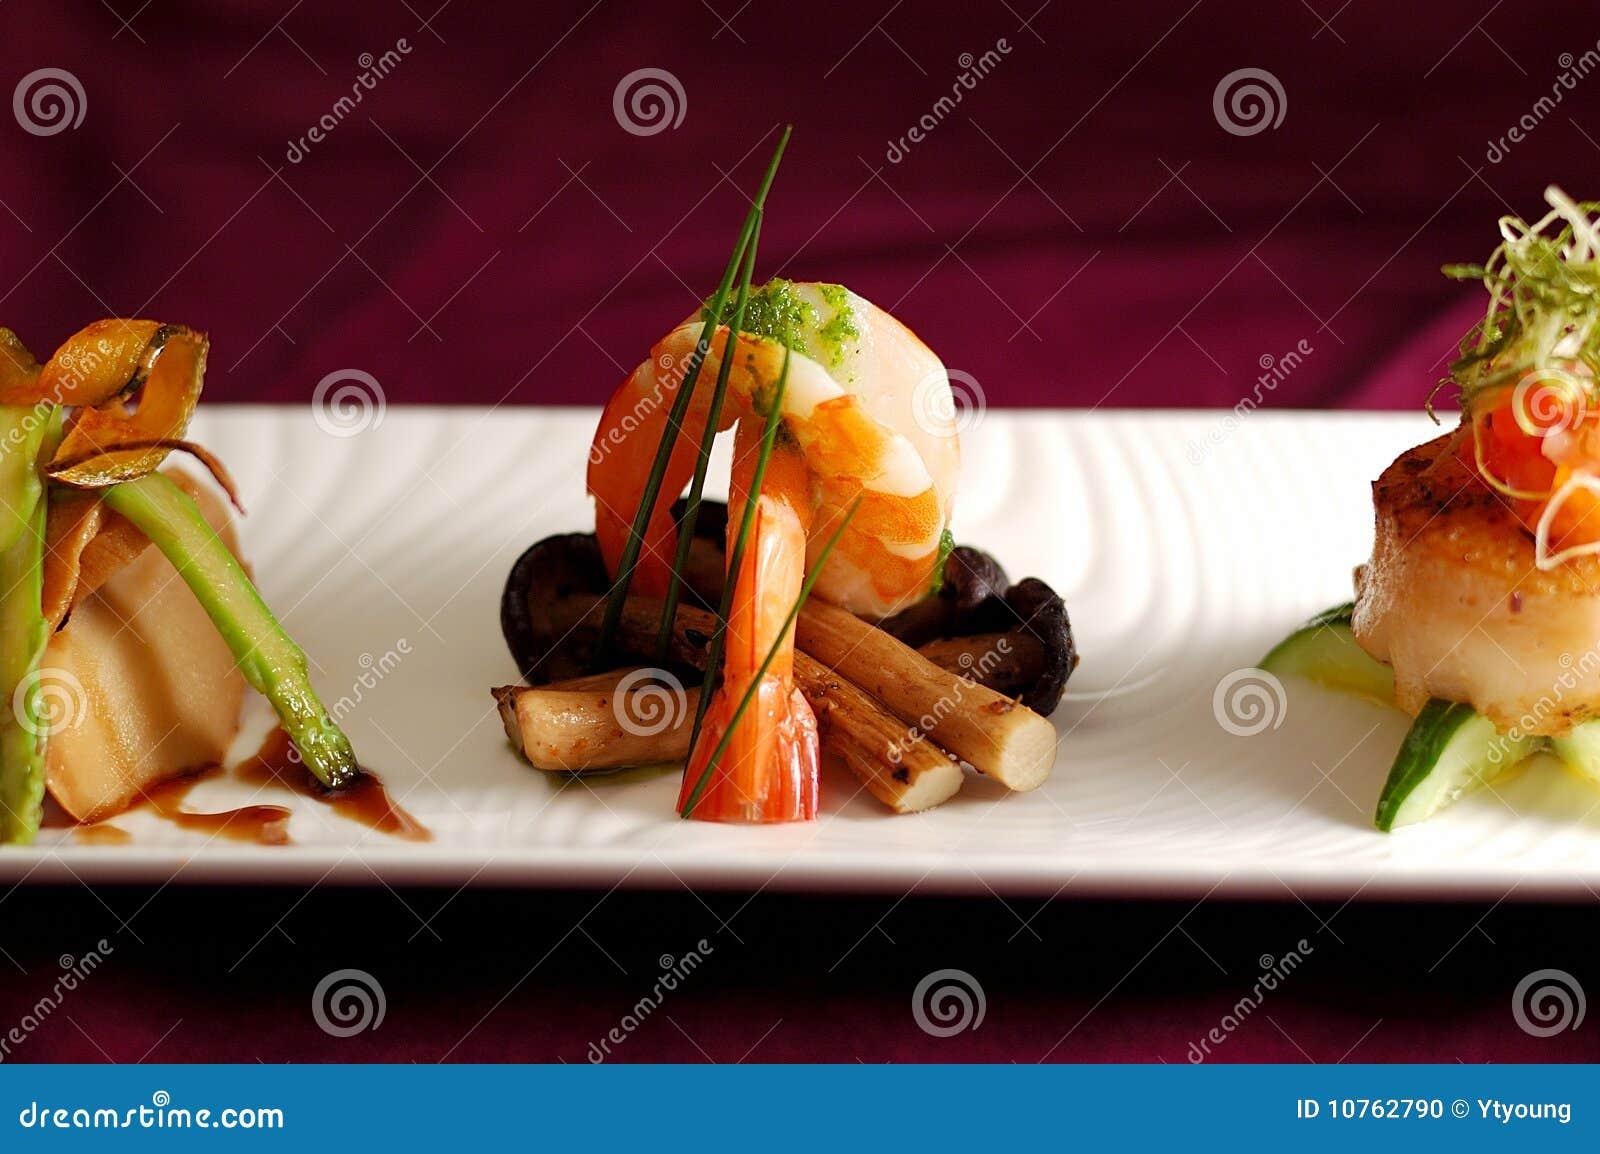 Creative cuisine appetizer shrimp seafood stock photo for Creation cuisine